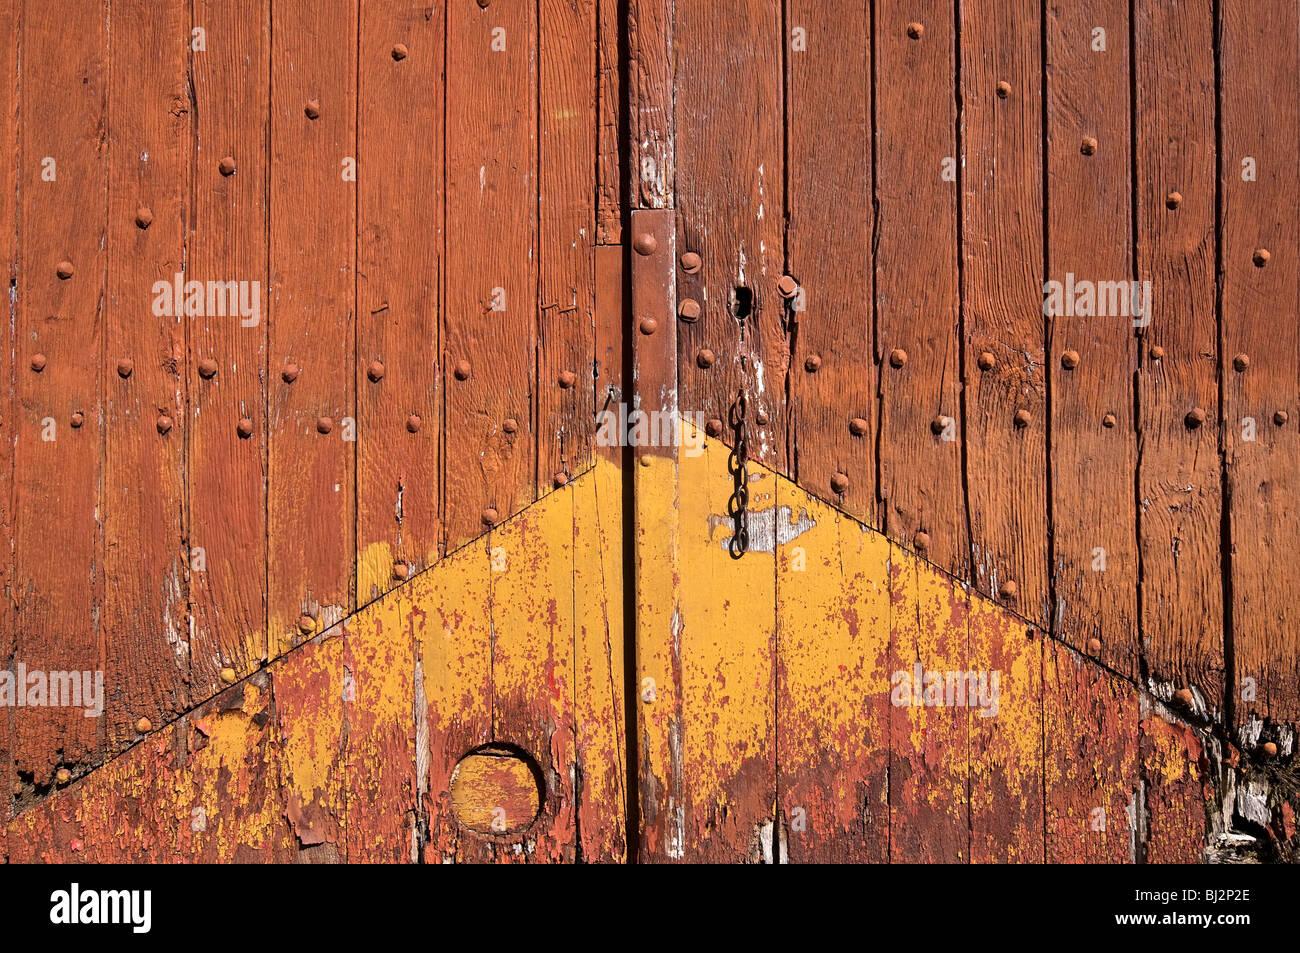 Old repaired wooden garage doors - France. - Stock Image